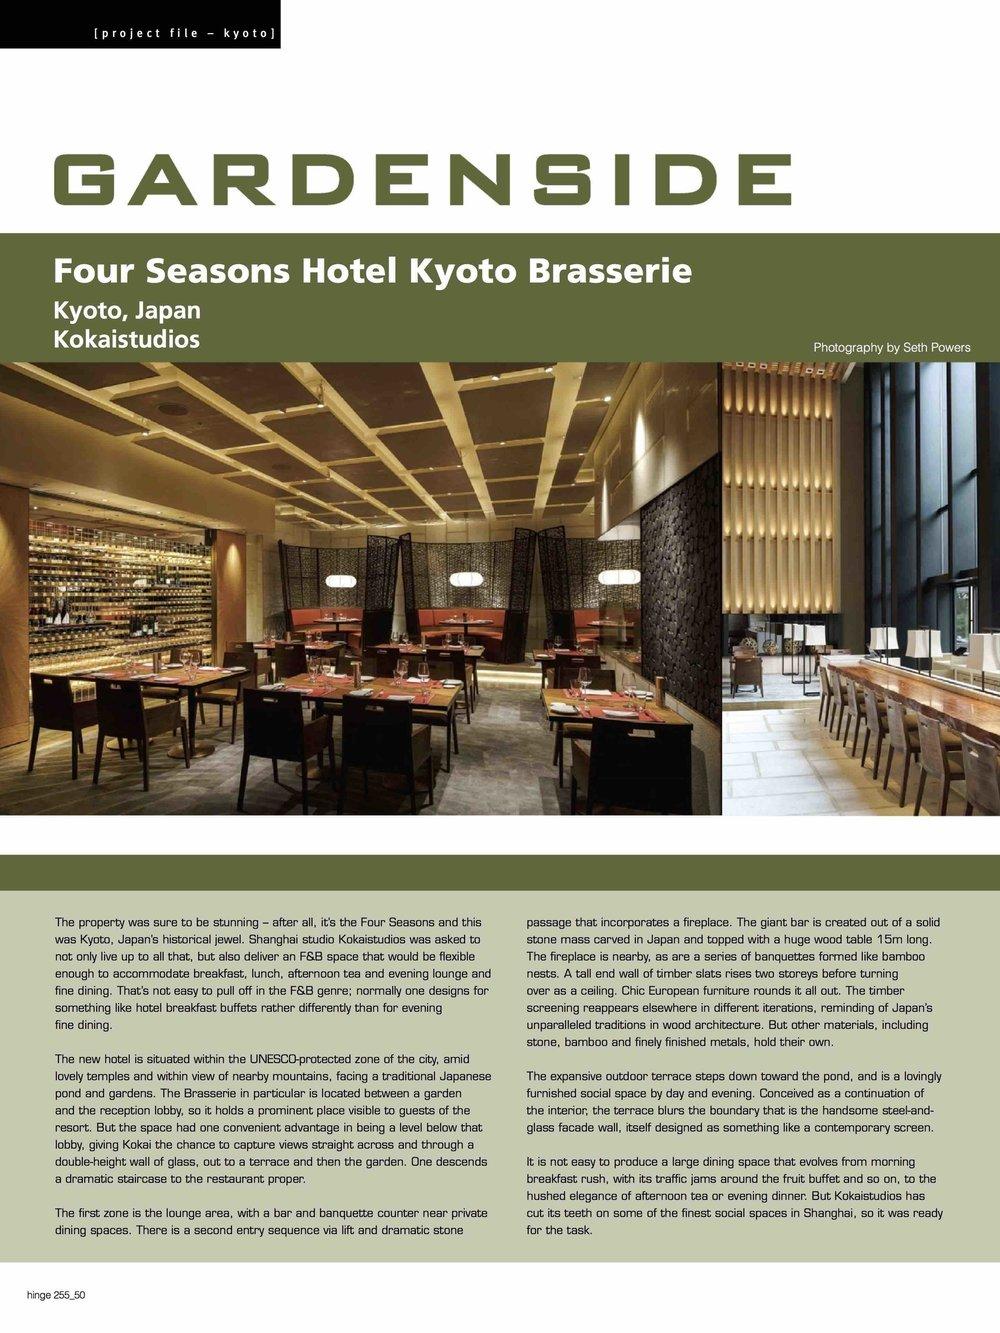 Hinge | May 2017 - Brasserie at Four Seasons Hotel Kyoto | Kokaistudios